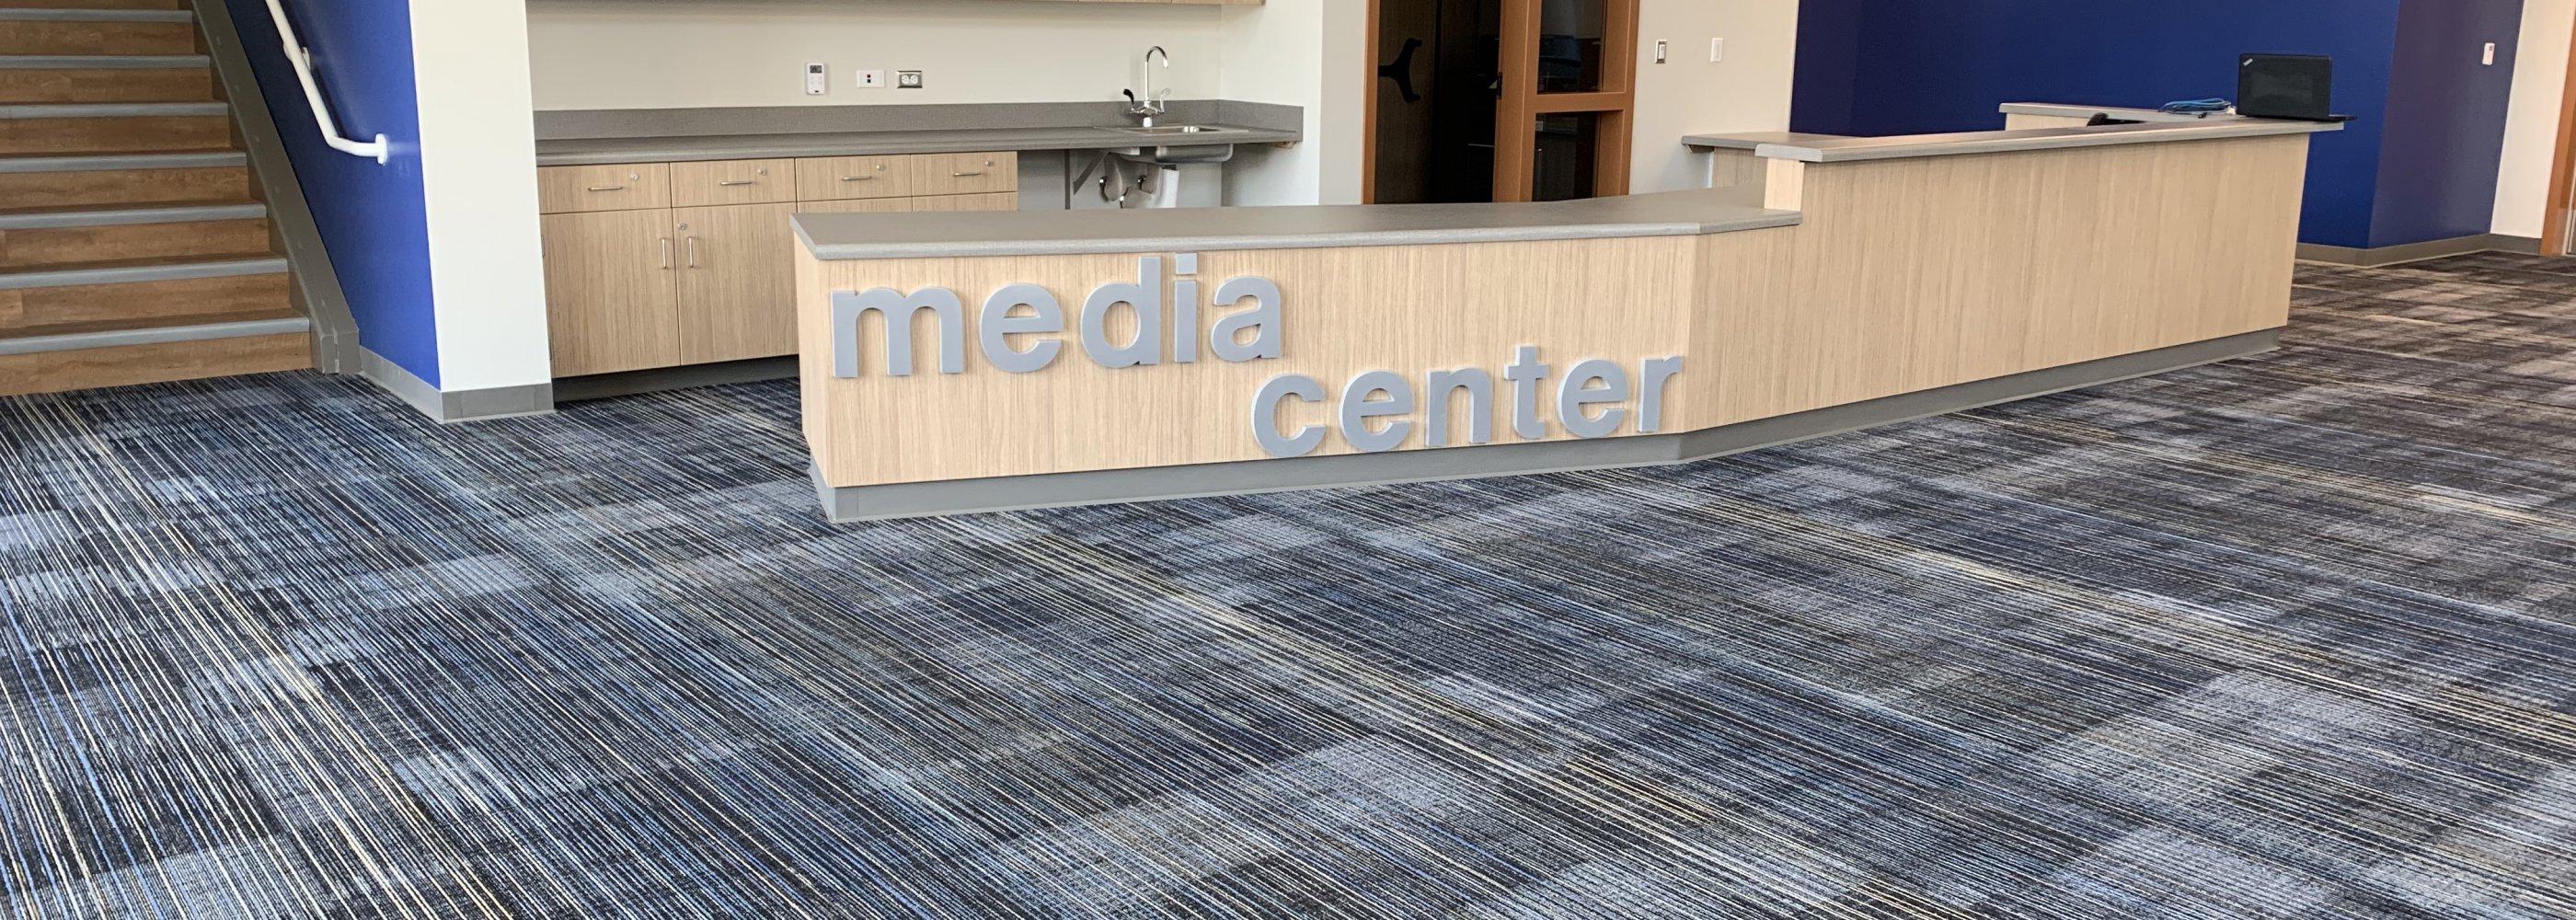 Loma Ridge Media Center